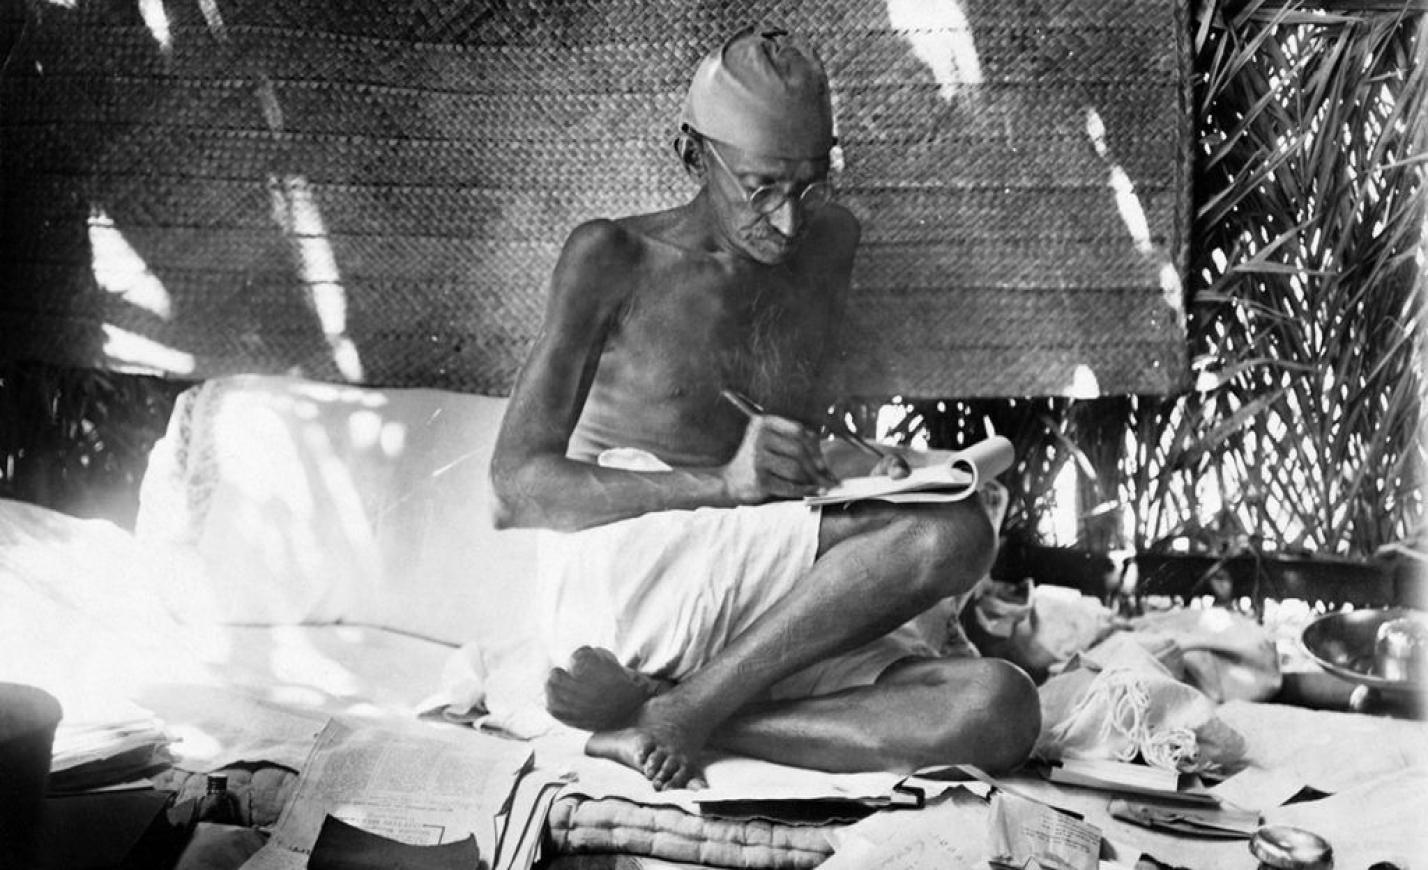 Hetven éve ölték meg Gandhit